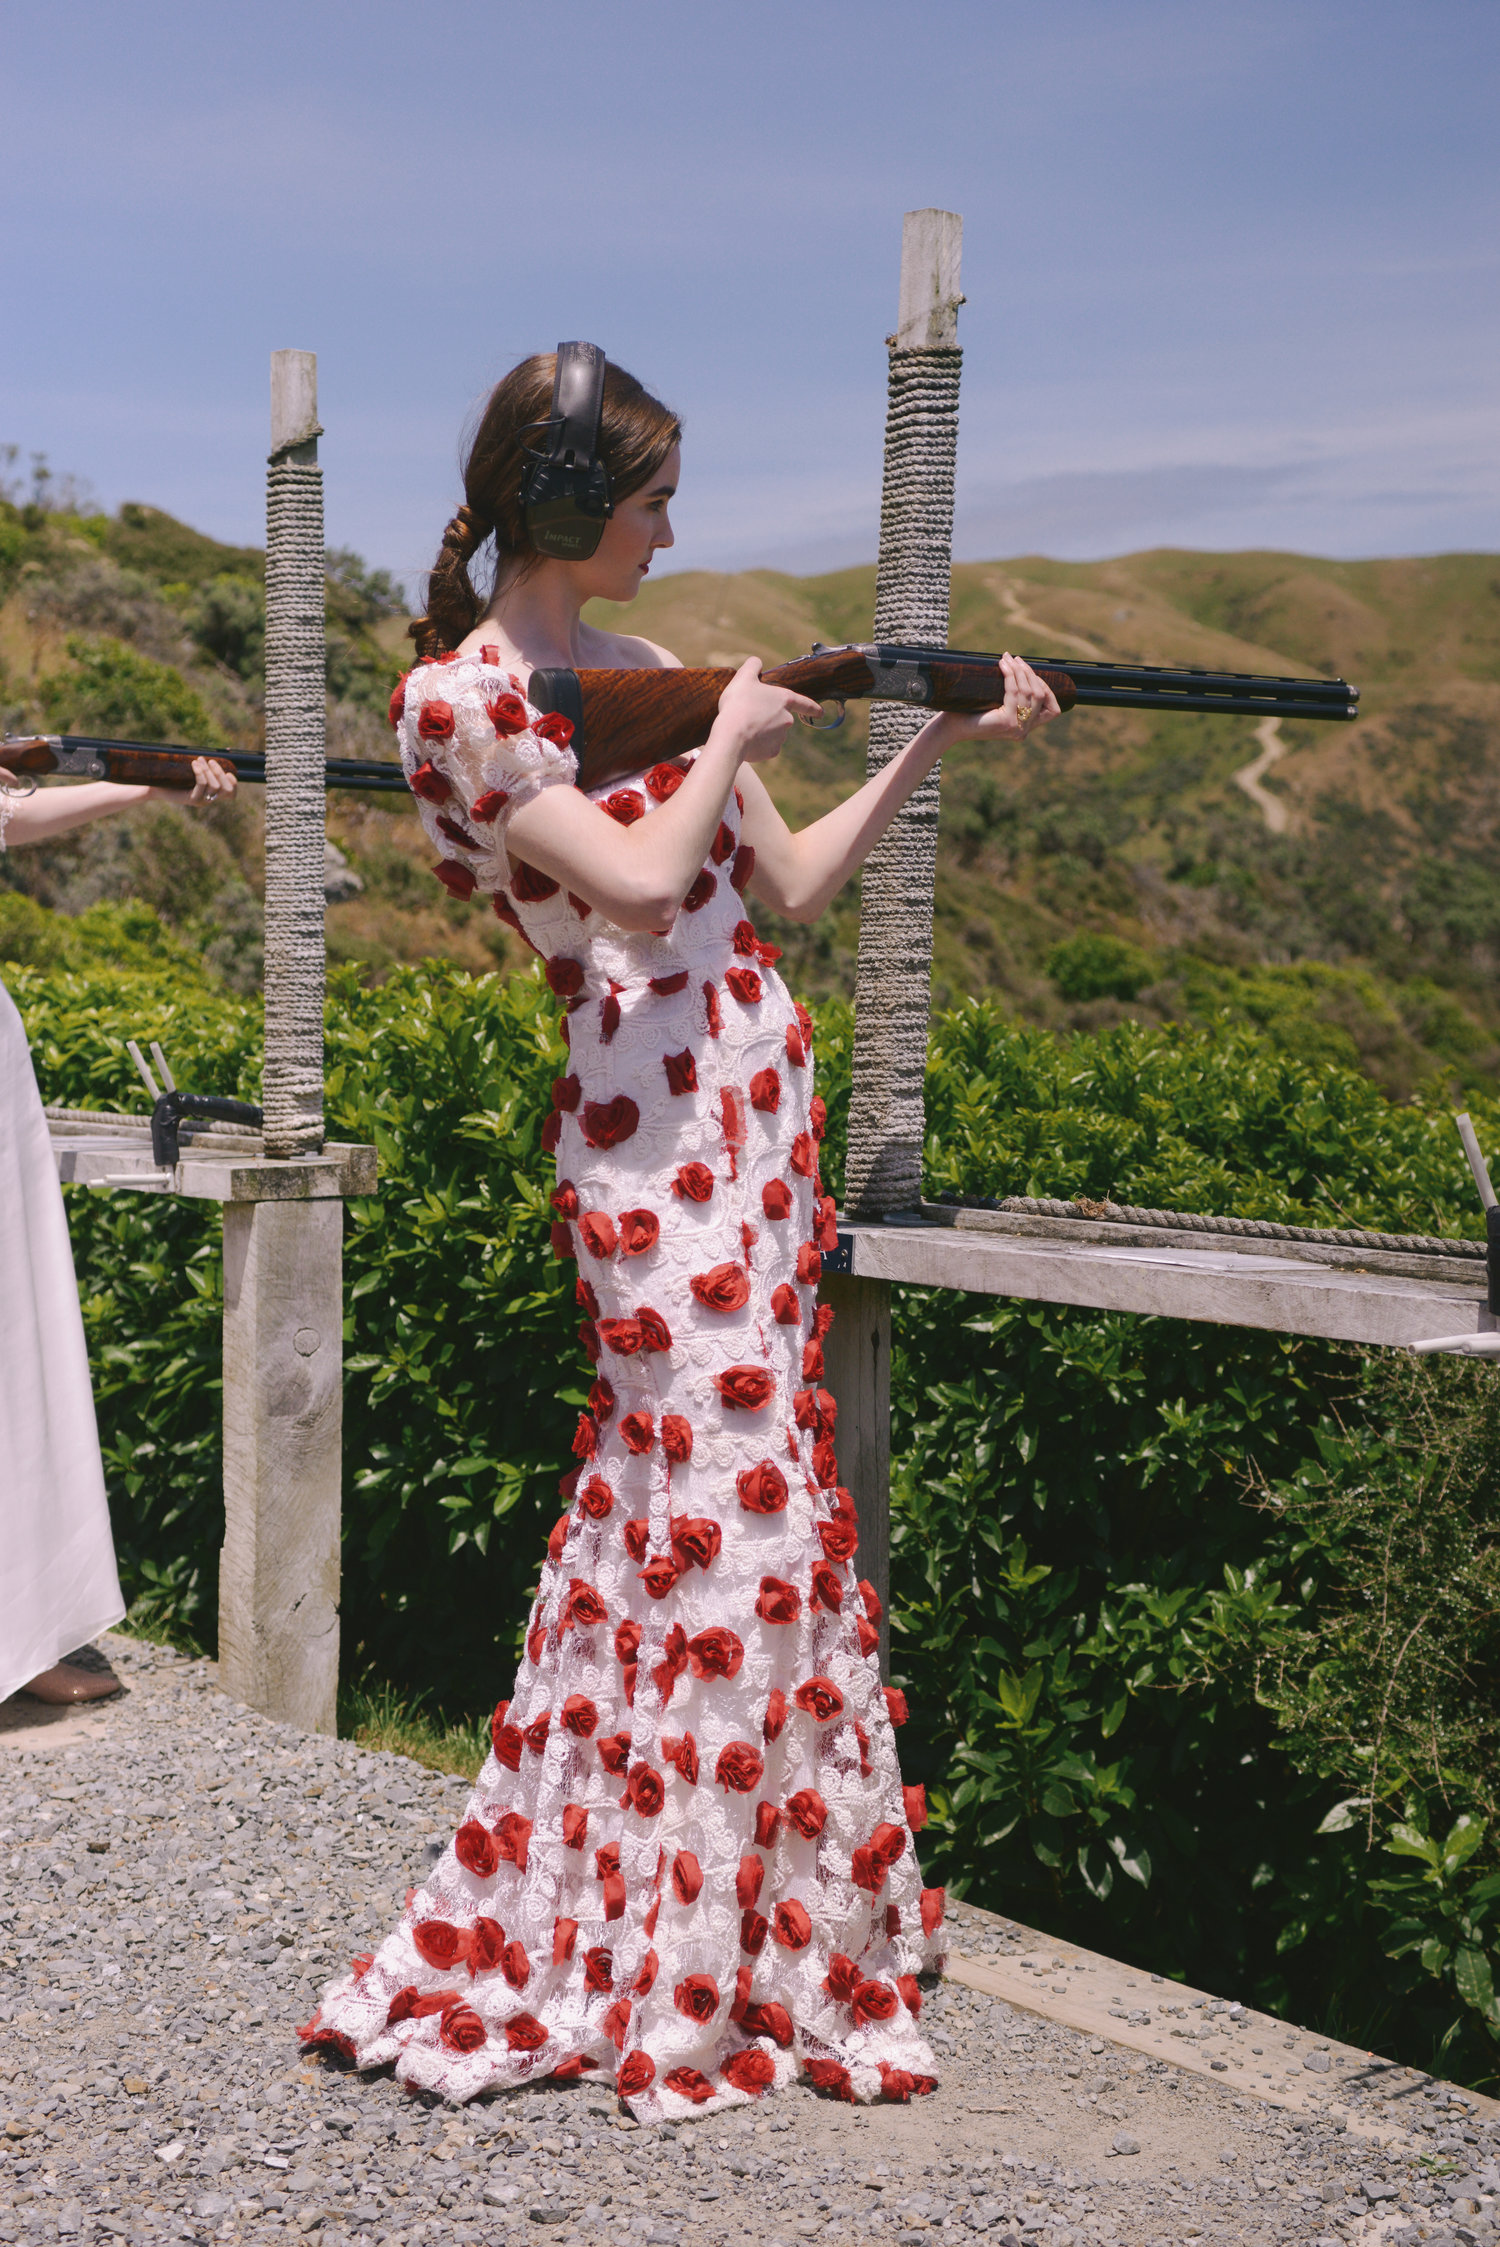 Well+Travelled+Bride+Wellington+Destination+Wedding+Guide+Boomrock.jpeg